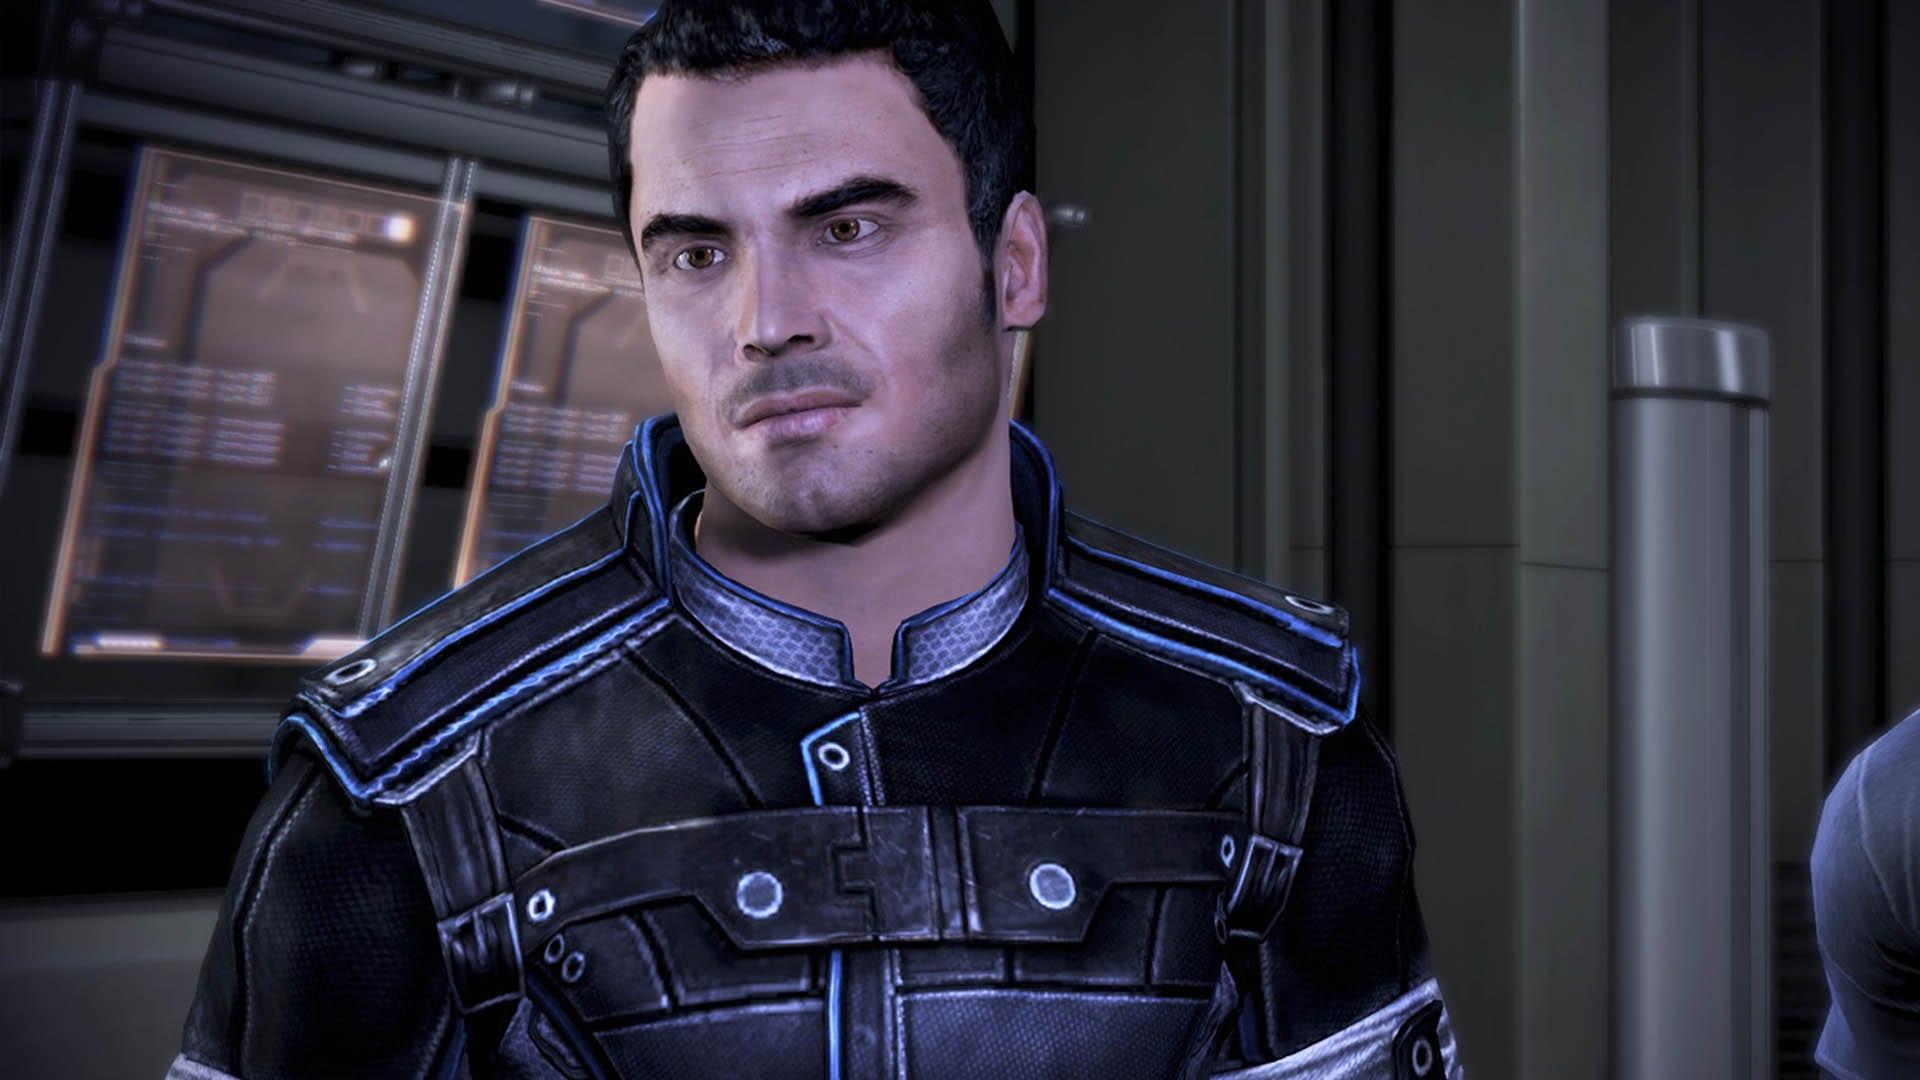 Mass Effect - Kaidan Alenko